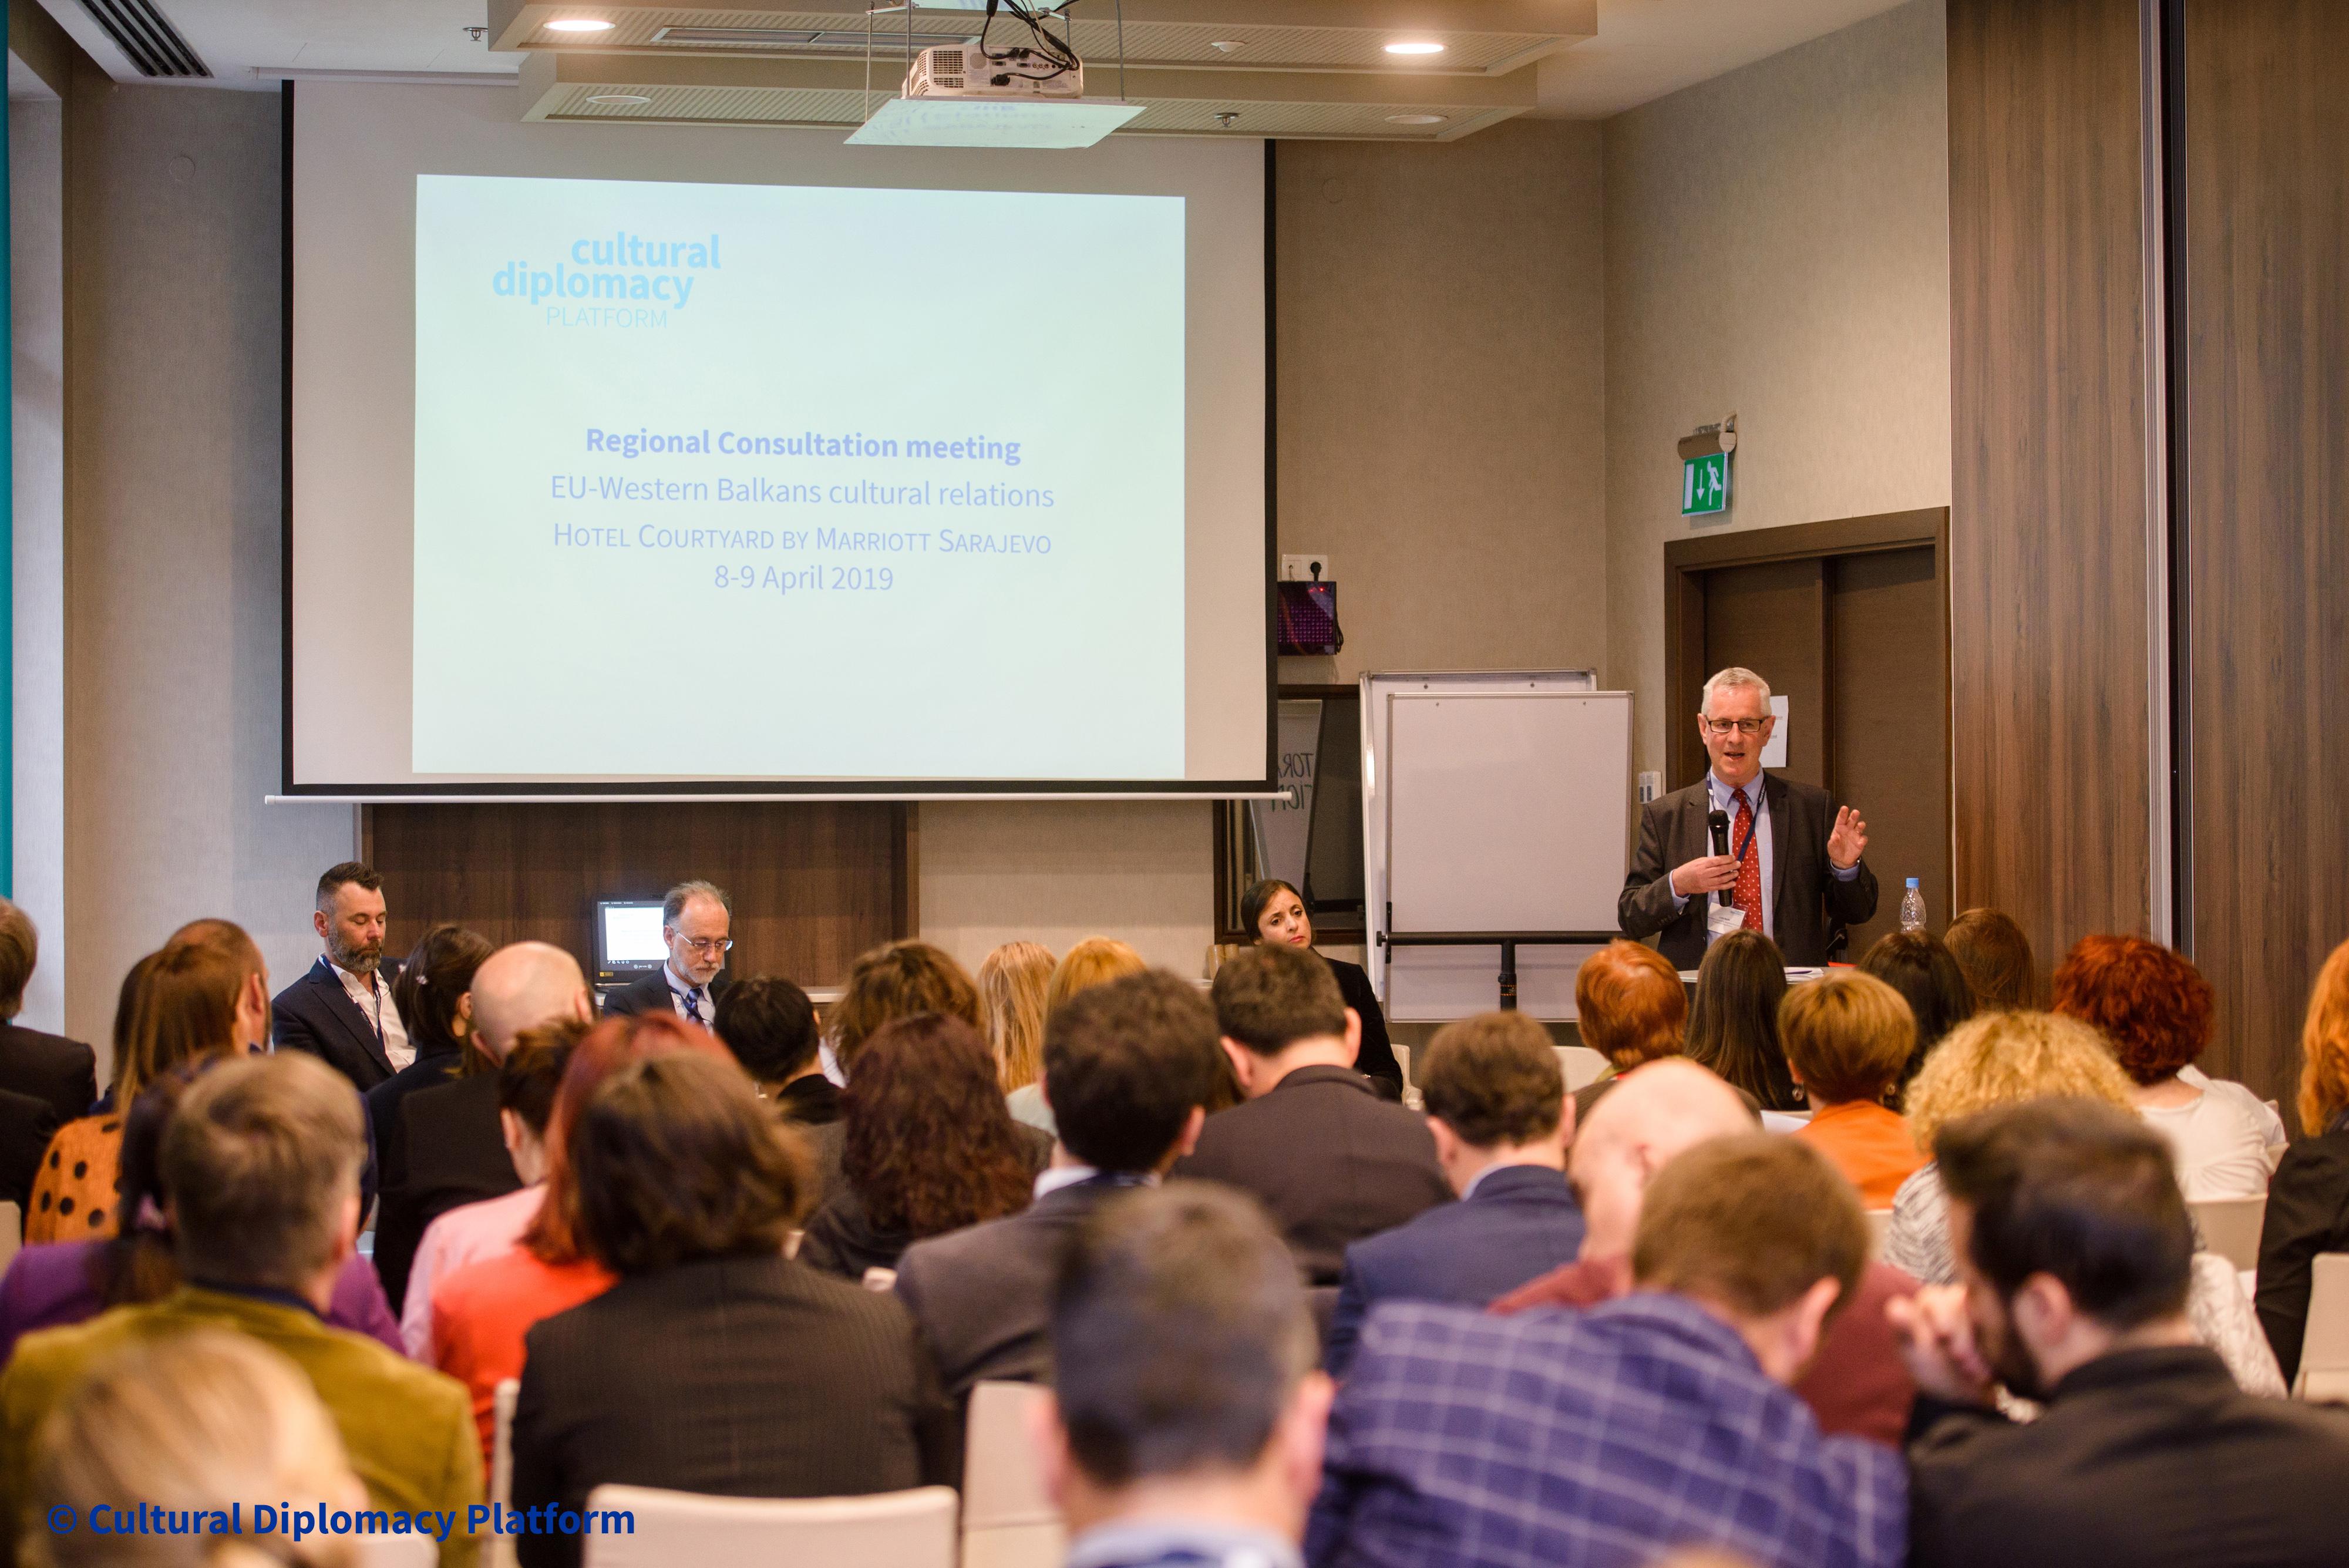 consultation meeting modis invite - HD4000×2670